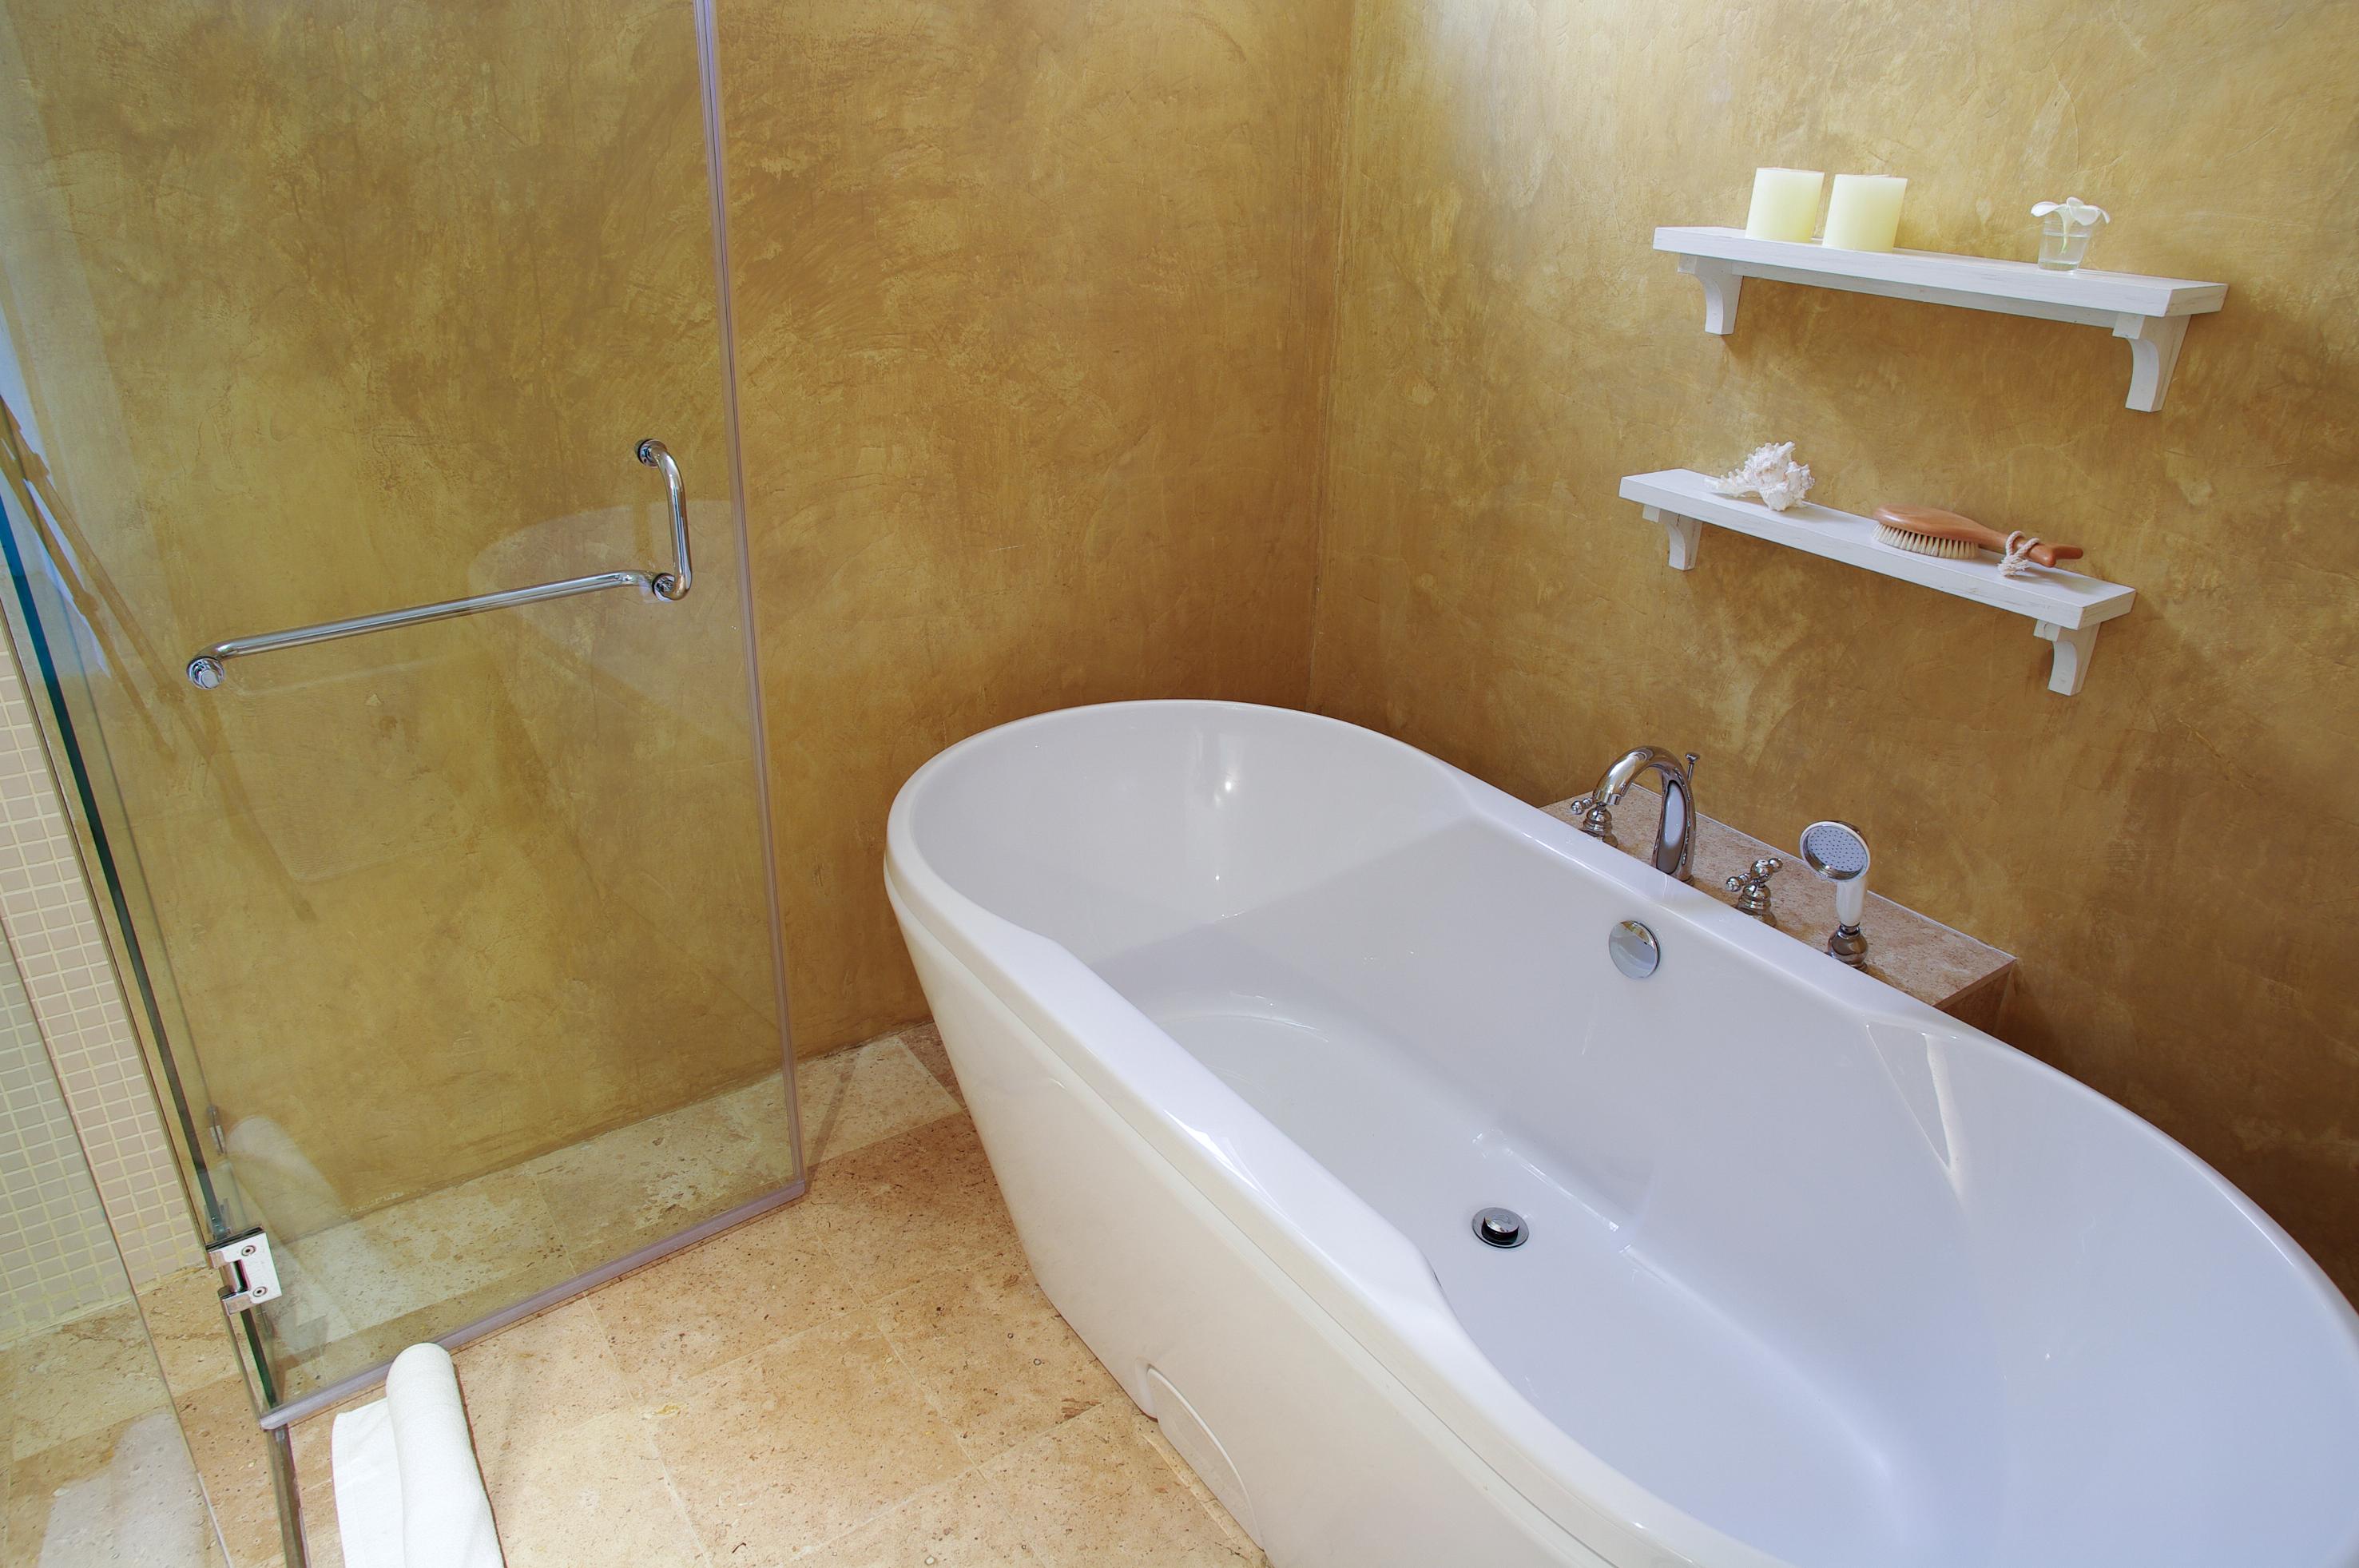 Bathroom Remodels - Right Source Roofing & Construction San Antonio